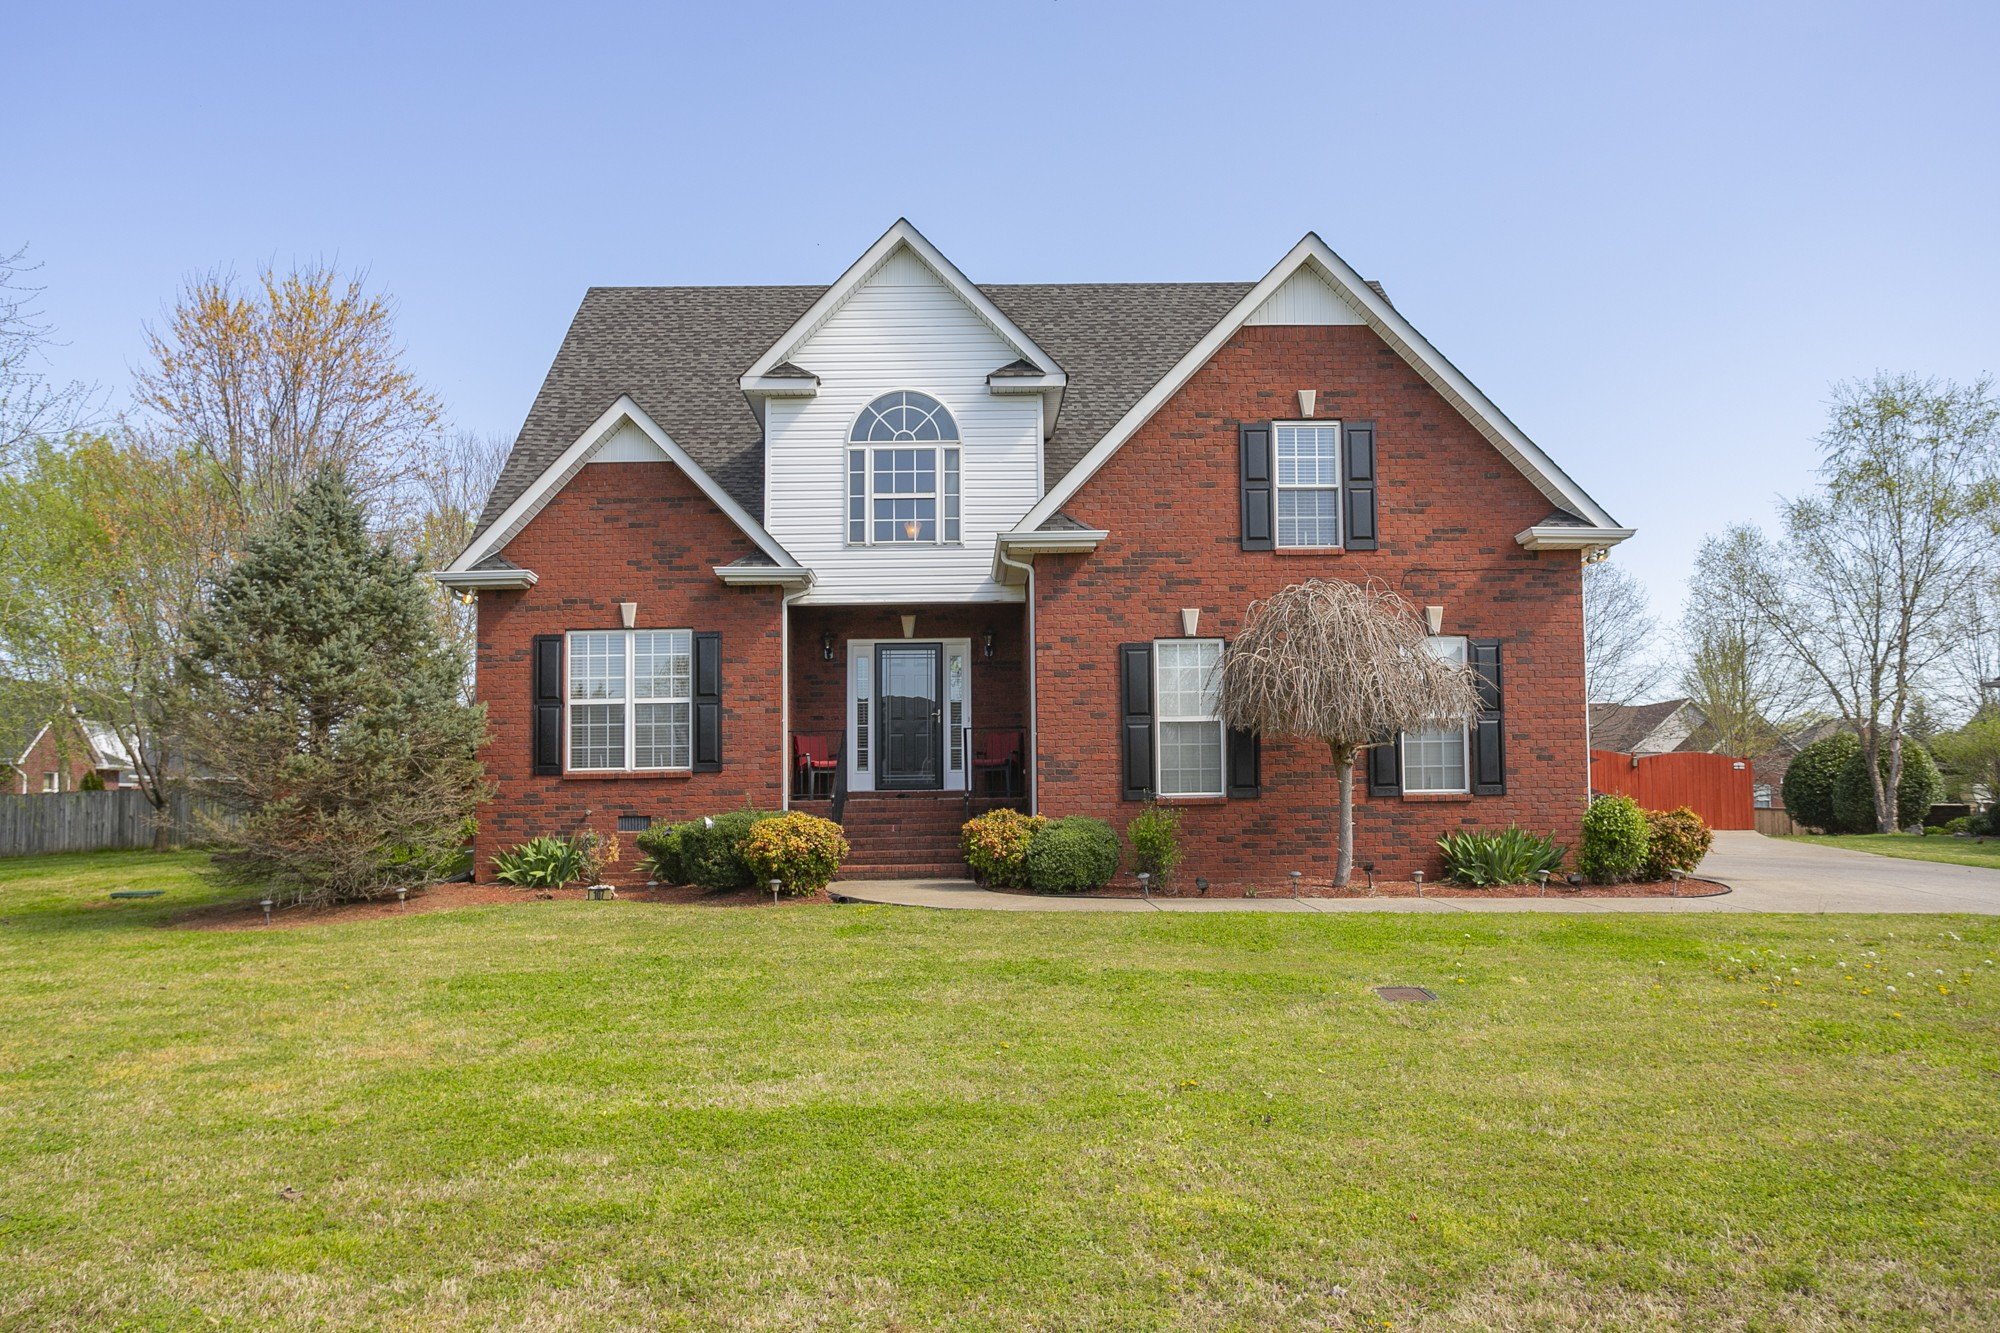 107 Home Pl Property Photo - Lascassas, TN real estate listing